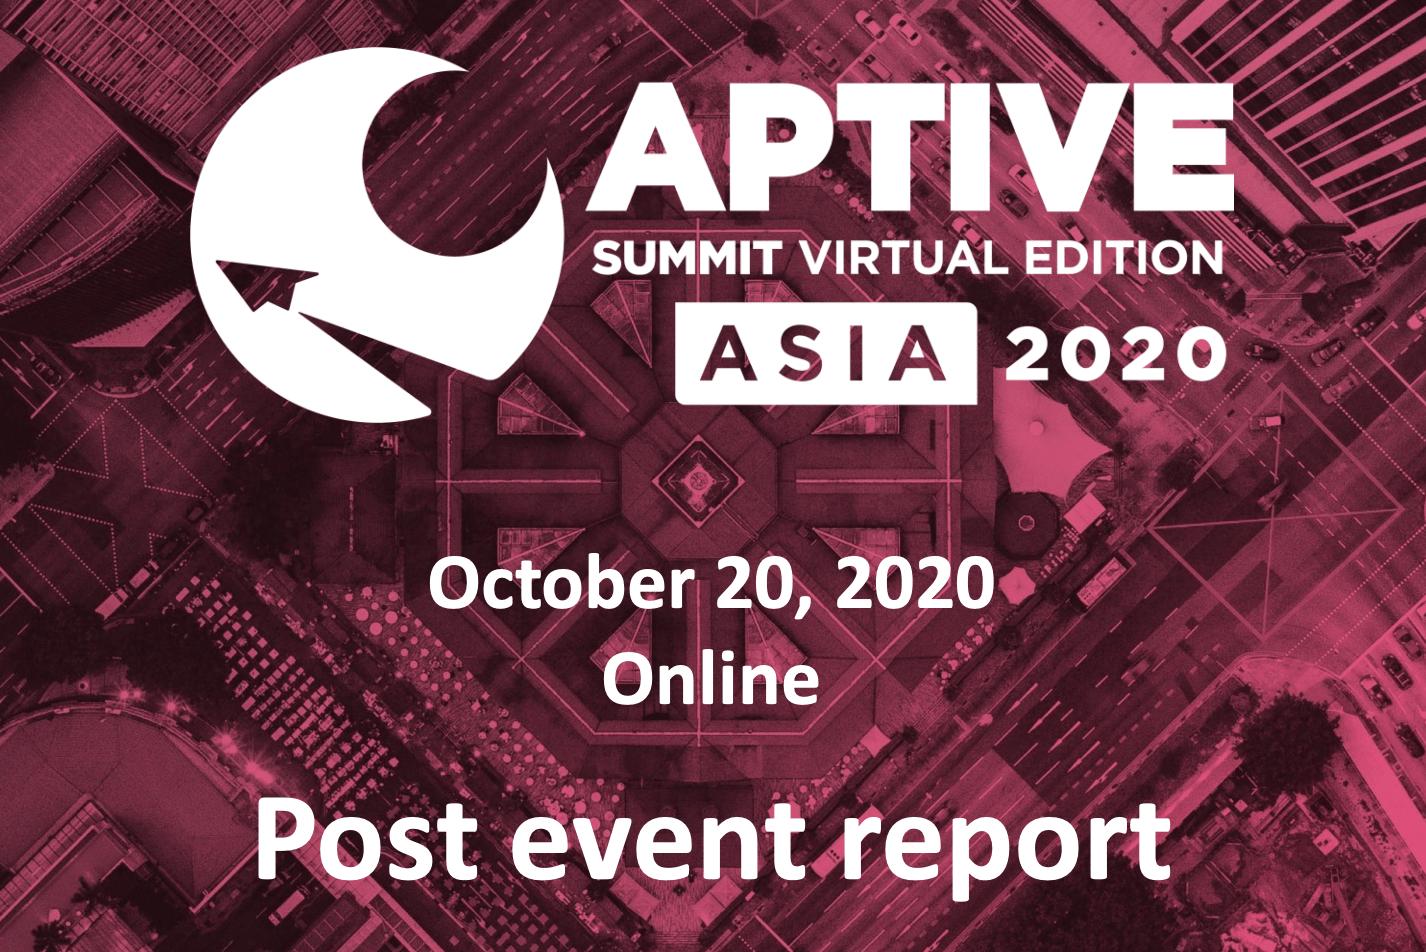 Captive Summit ASIA 2020